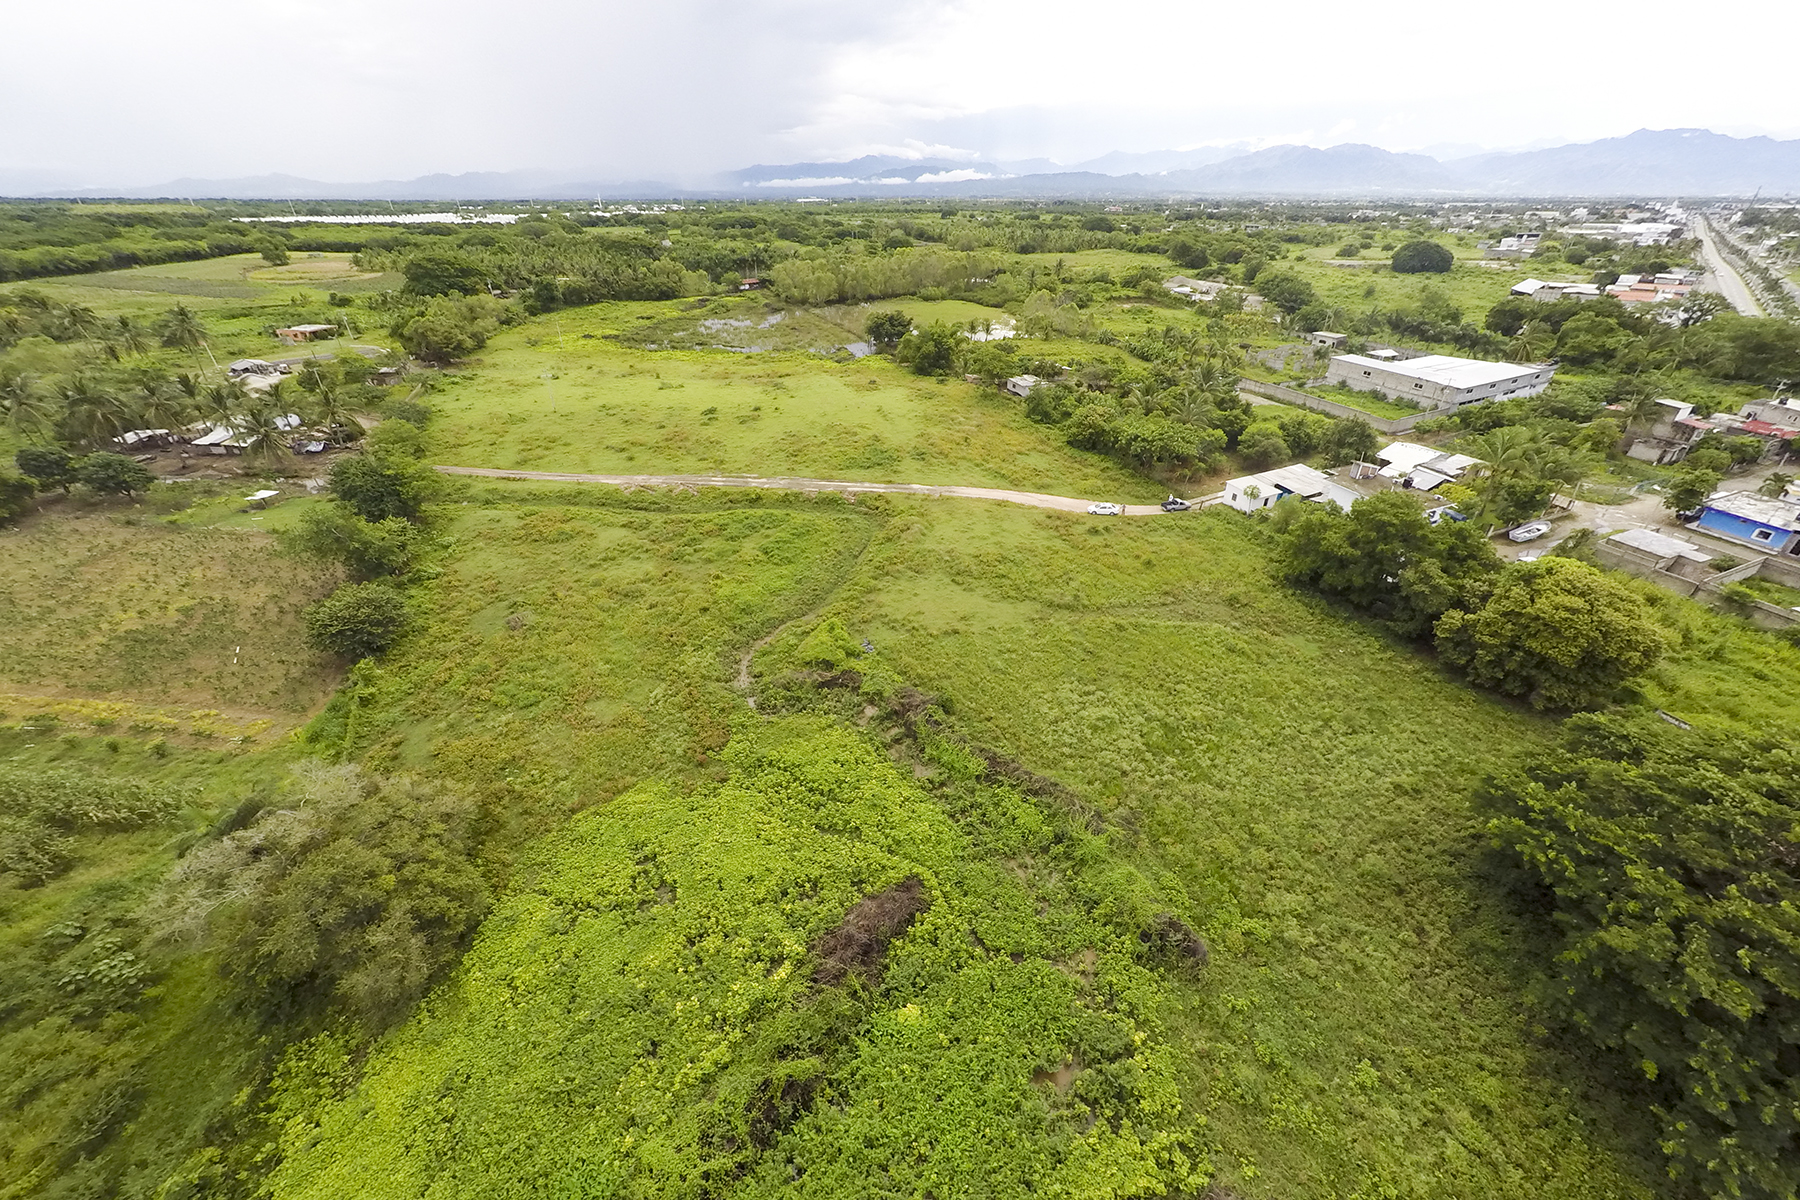 Additional photo for property listing at Lote Tondoroque Carretera Puerto Vallarta - Tepic Entre Tondoroque y Mezcales Nuevo Vallarta, Nayarit 63737 México